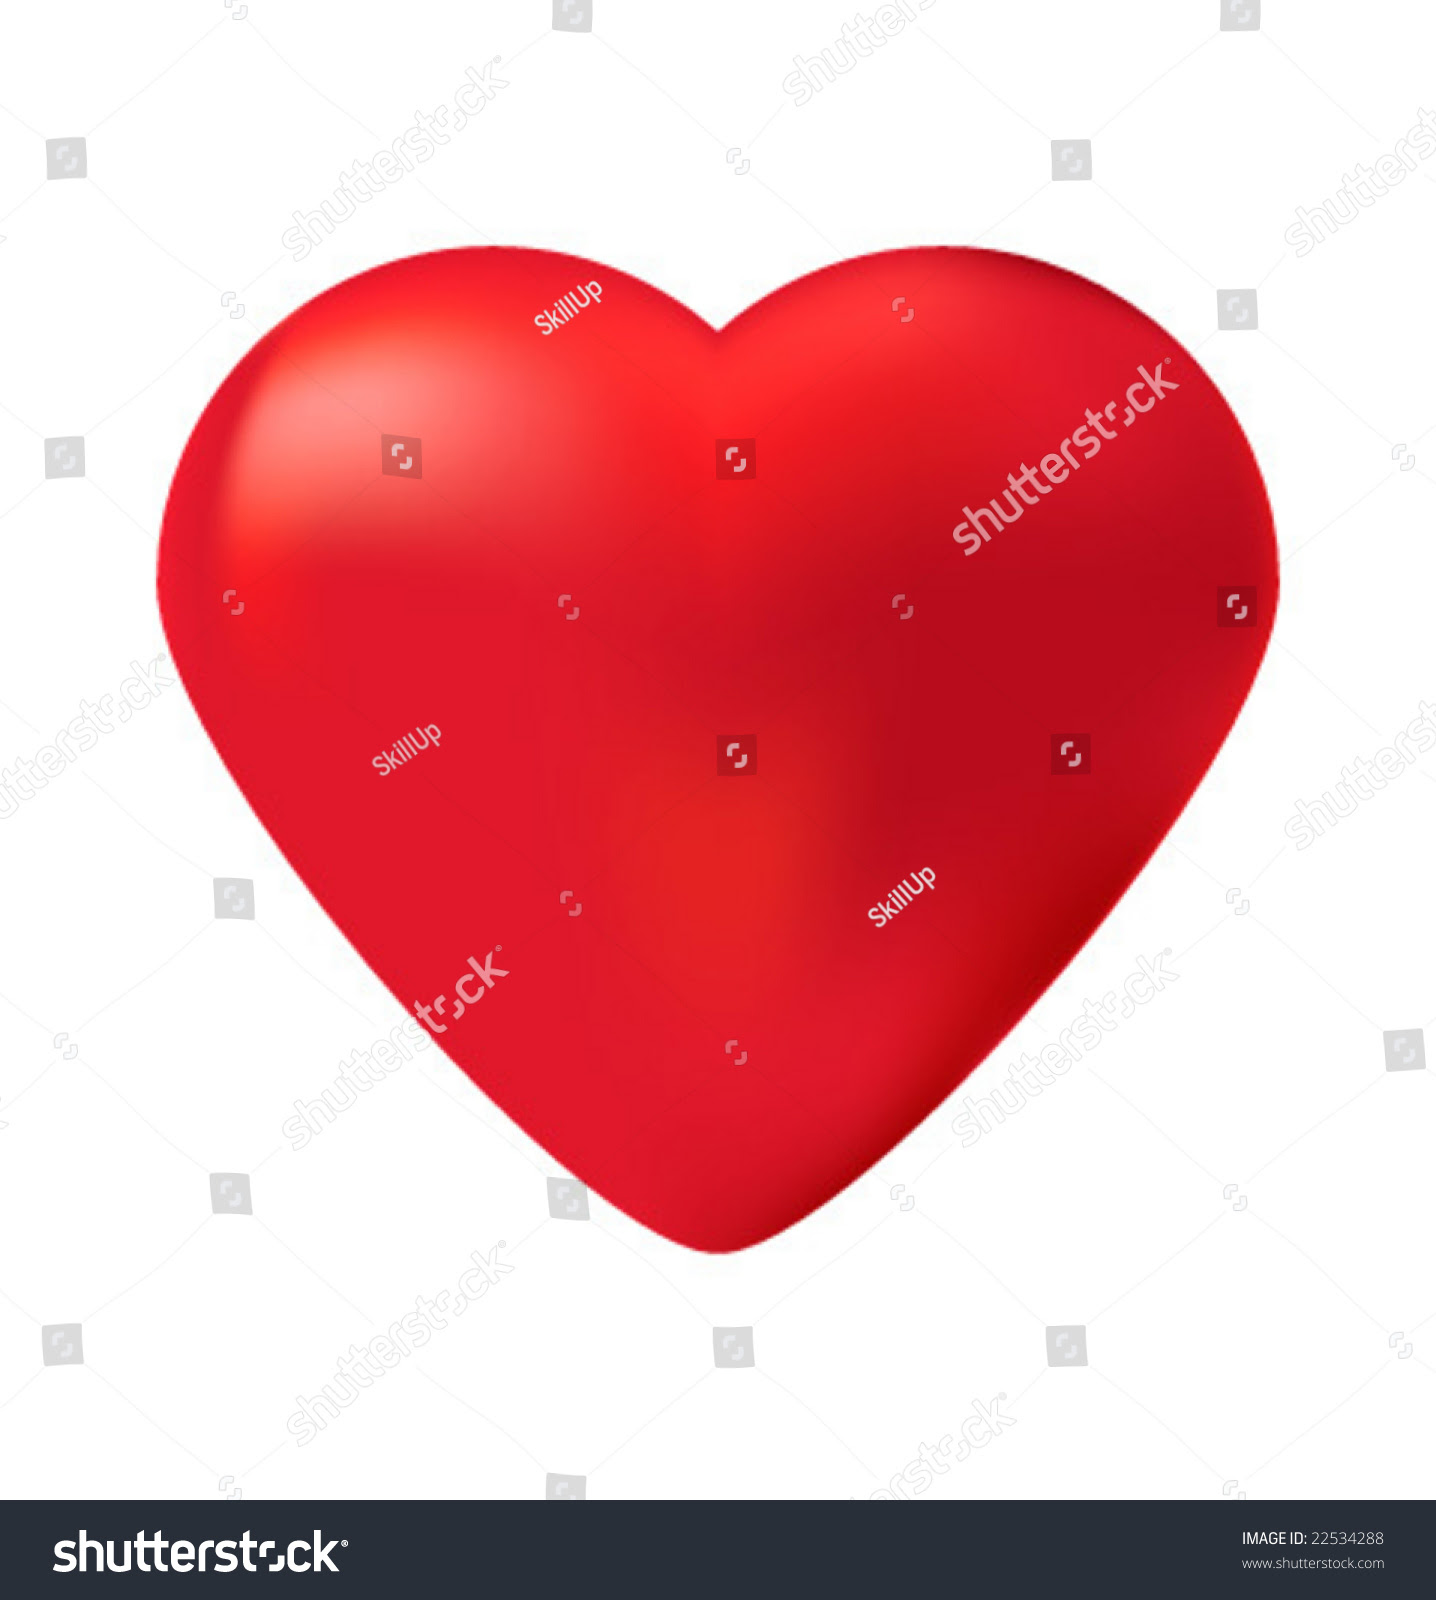 Vector Editable Heart Stock Vector 22534288 - Shutterstock